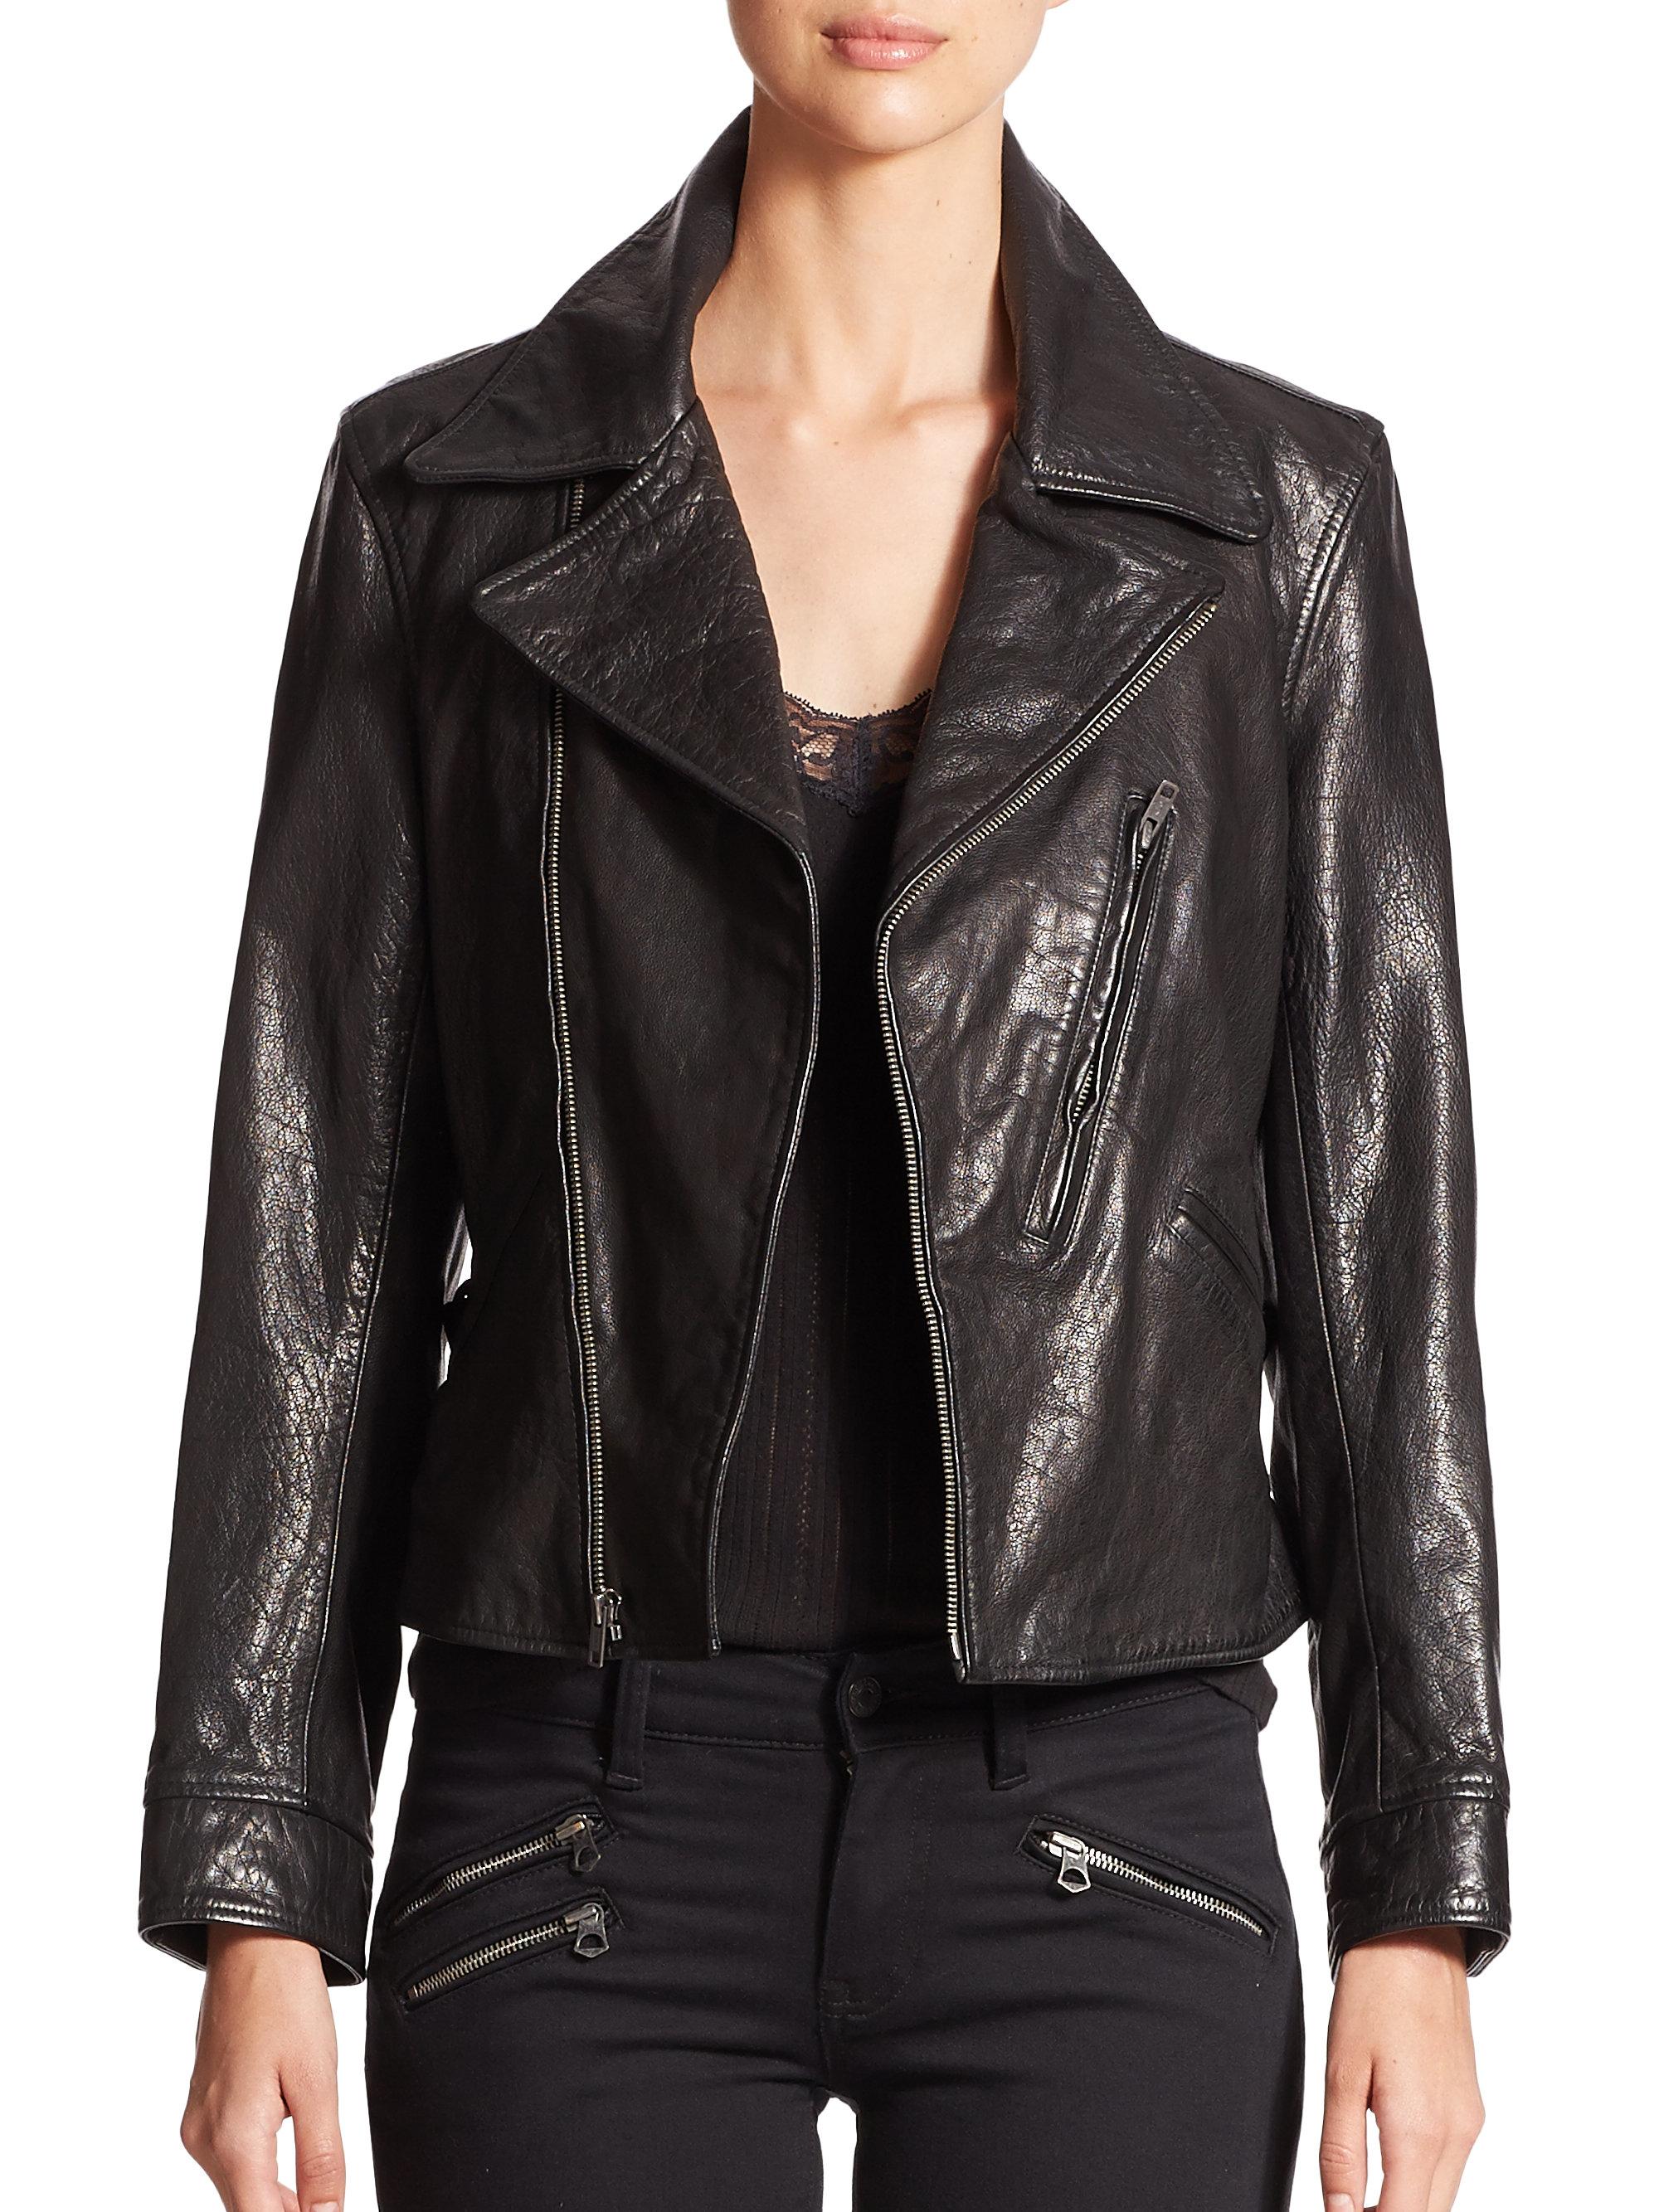 Ralph lauren polo leather jacket